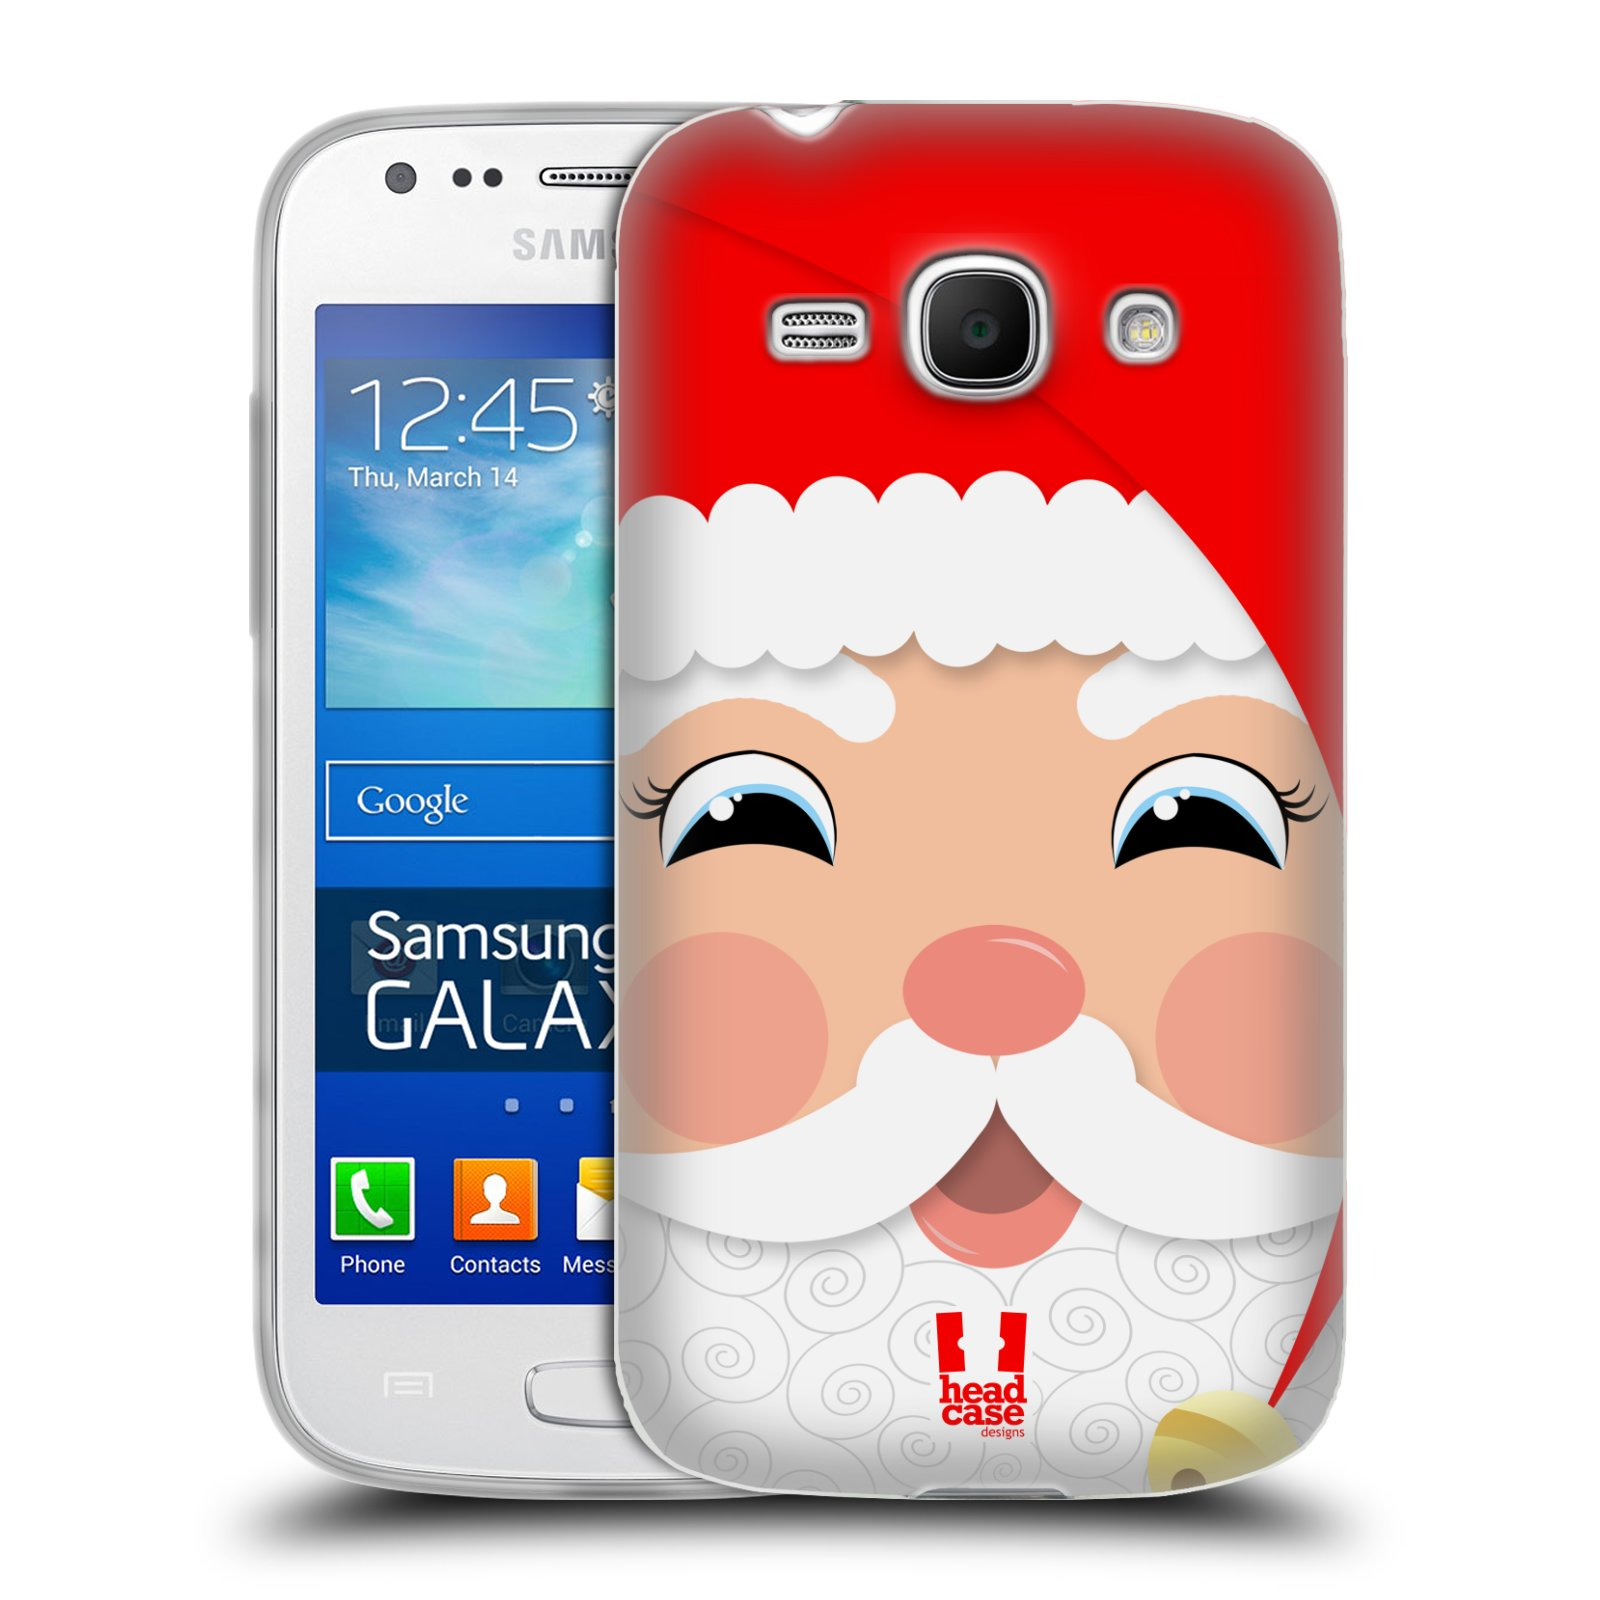 HEAD CASE silikonový obal na mobil Samsung Galaxy Ace 3 vzor Vánoční tváře kreslené SANTA CLAUS